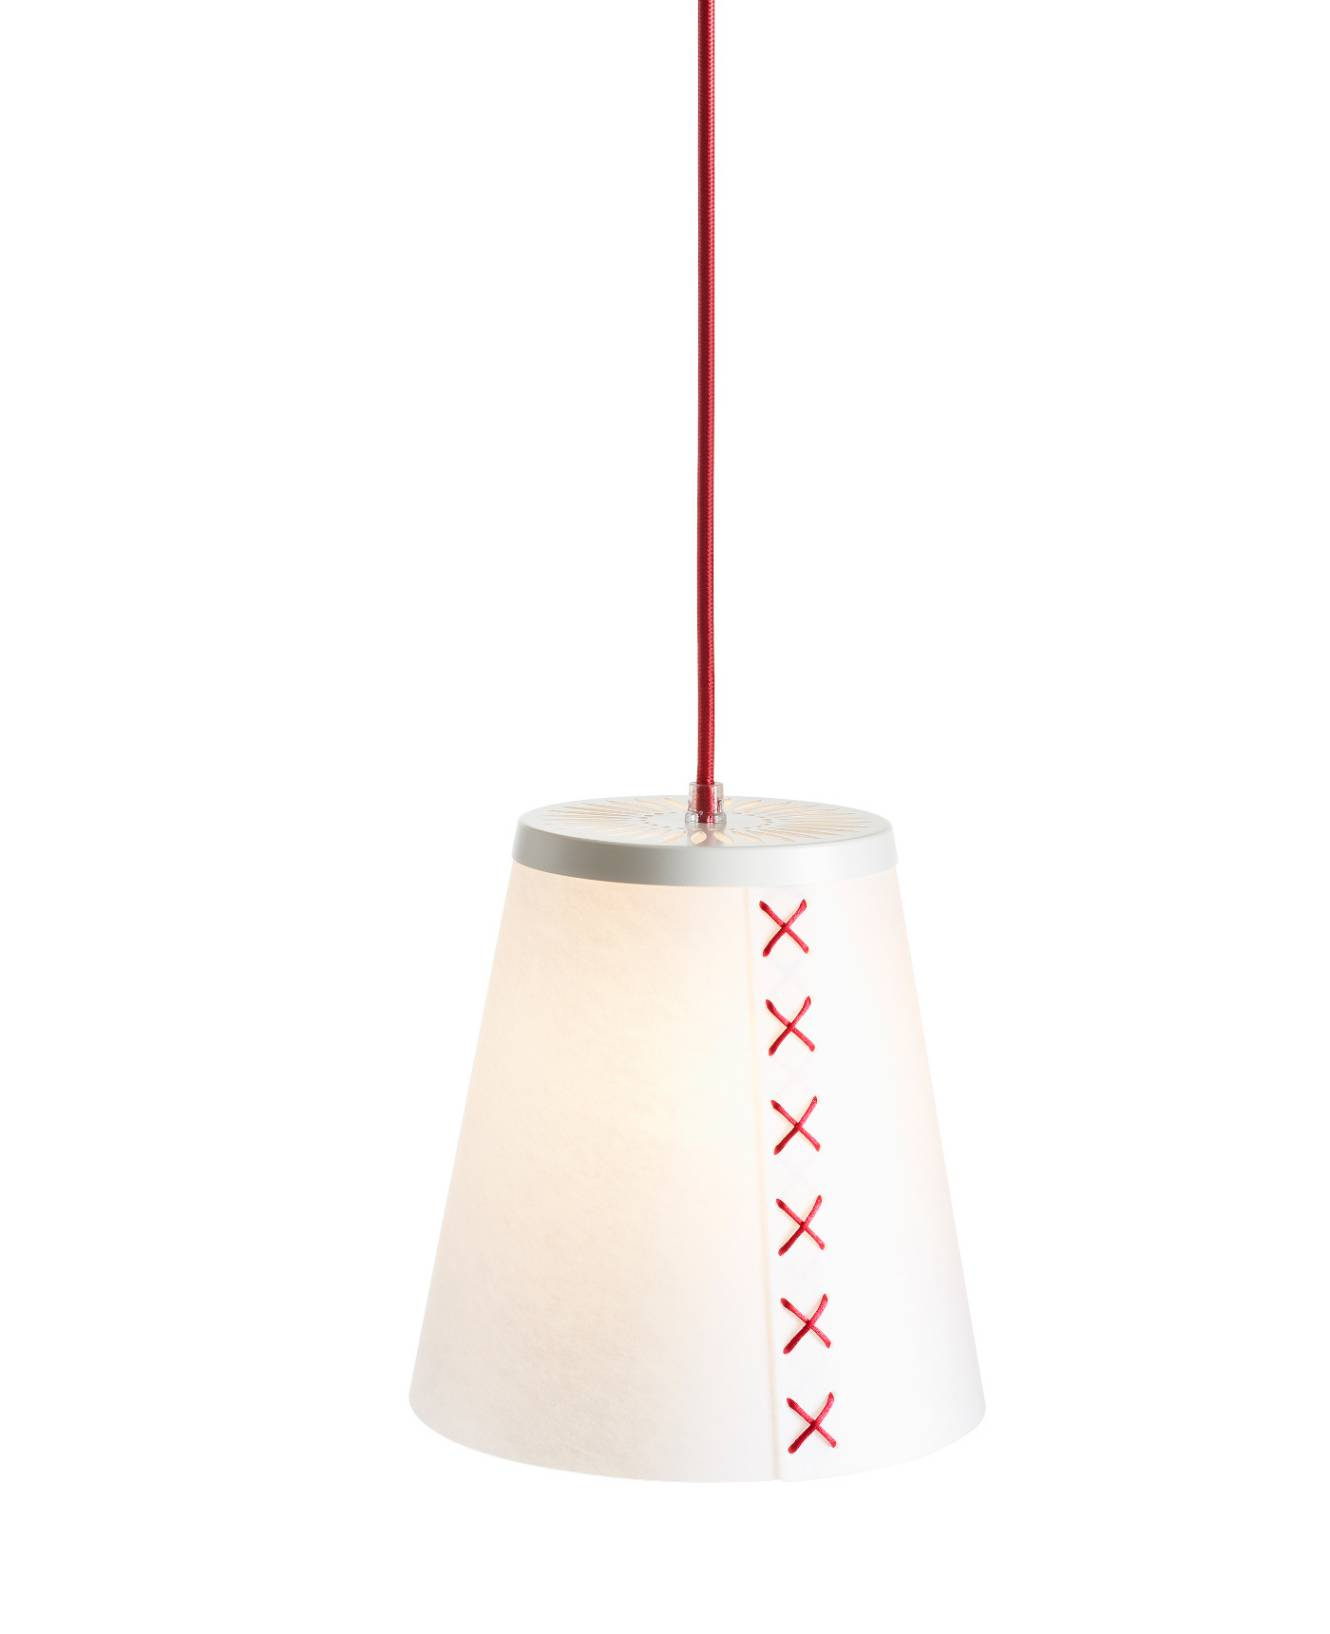 Domus Flör Pendelleuchte Design Leuchte